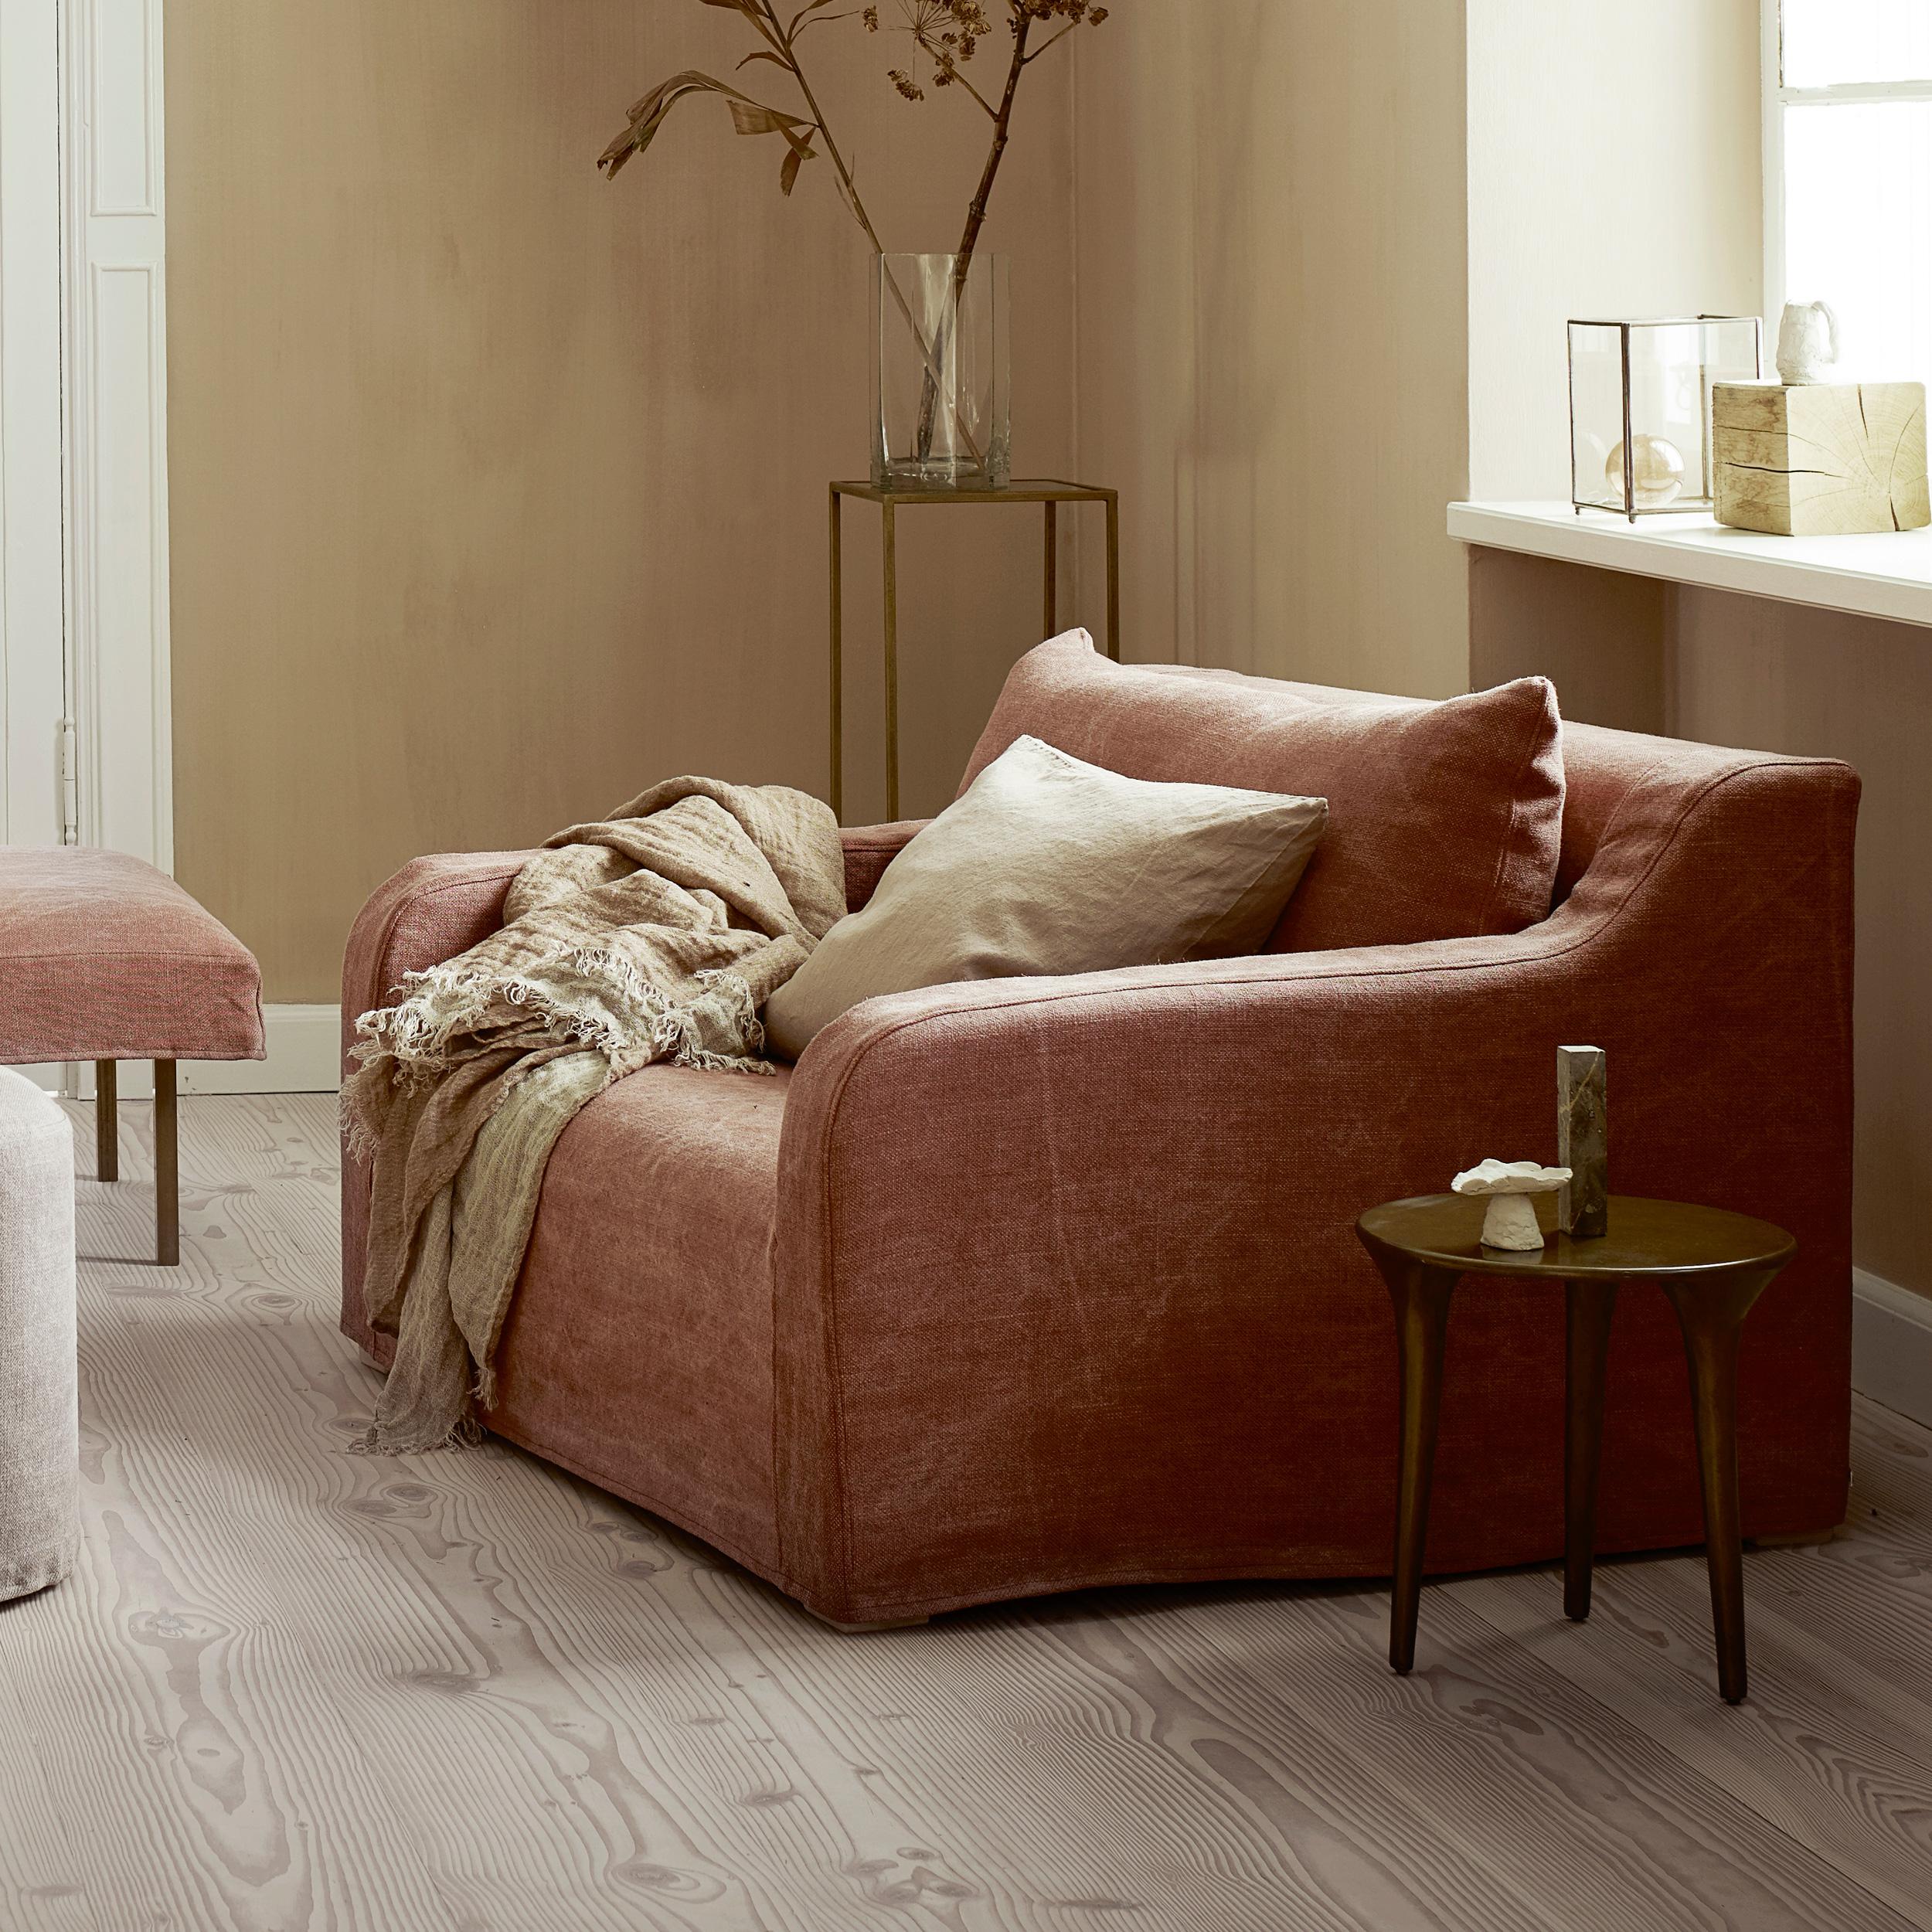 Strange Couch Frida Mit Husse Aus Stonewashed Linen In Der Farbe Rust 200 Cm Lang Interior Design Ideas Greaswefileorg